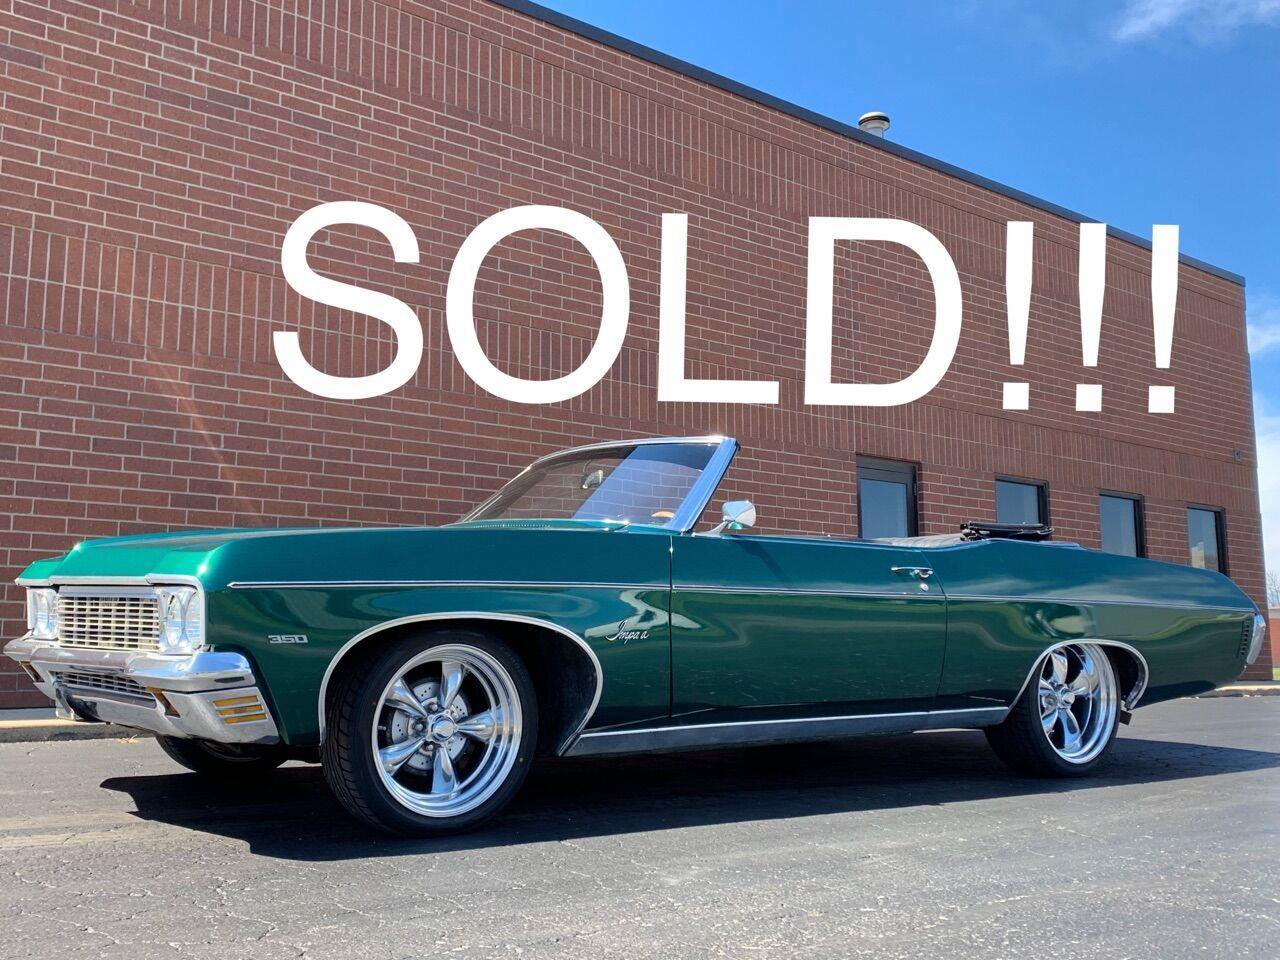 1970 Chevrolet Impala (CC-1344755) for sale in Geneva, Illinois